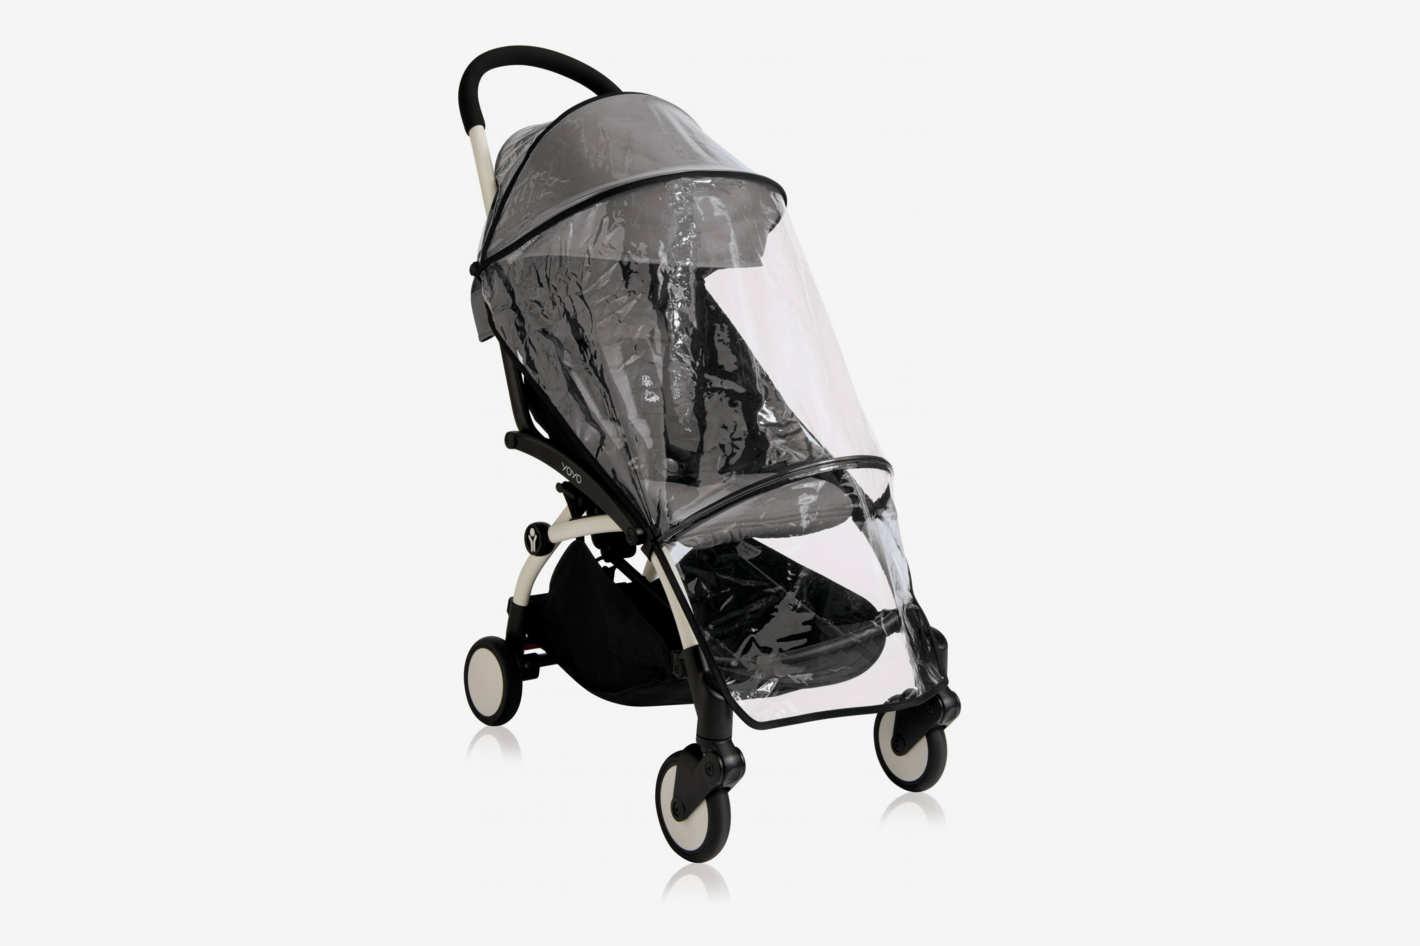 Babyzen Rain Cover for Yoyo+ 6 Stroller